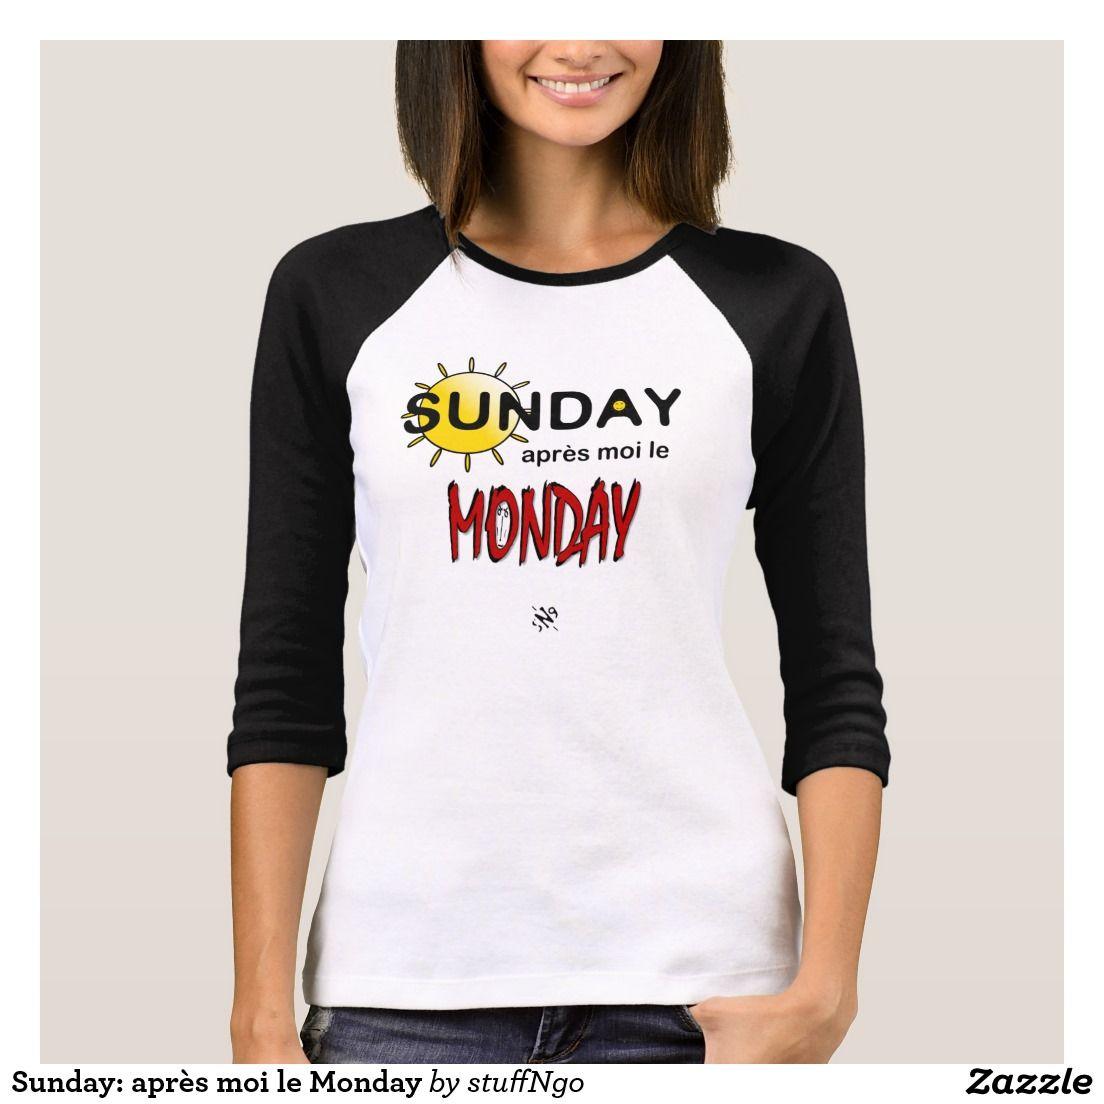 Sunday: après moi le Monday T-Shirt #tshirt #tshirtsdesign #tshirtdesign #apparel #humor #joke #jokes #motto #slogan #slogantshirt  #weekend #weekendvibes #weekendstyle #weekendfun #sunday #sundayvibes #sundayfunday #sundaymood #monday #moodoftheday #moody #feelingblue #ihatemondays #downwithmonday